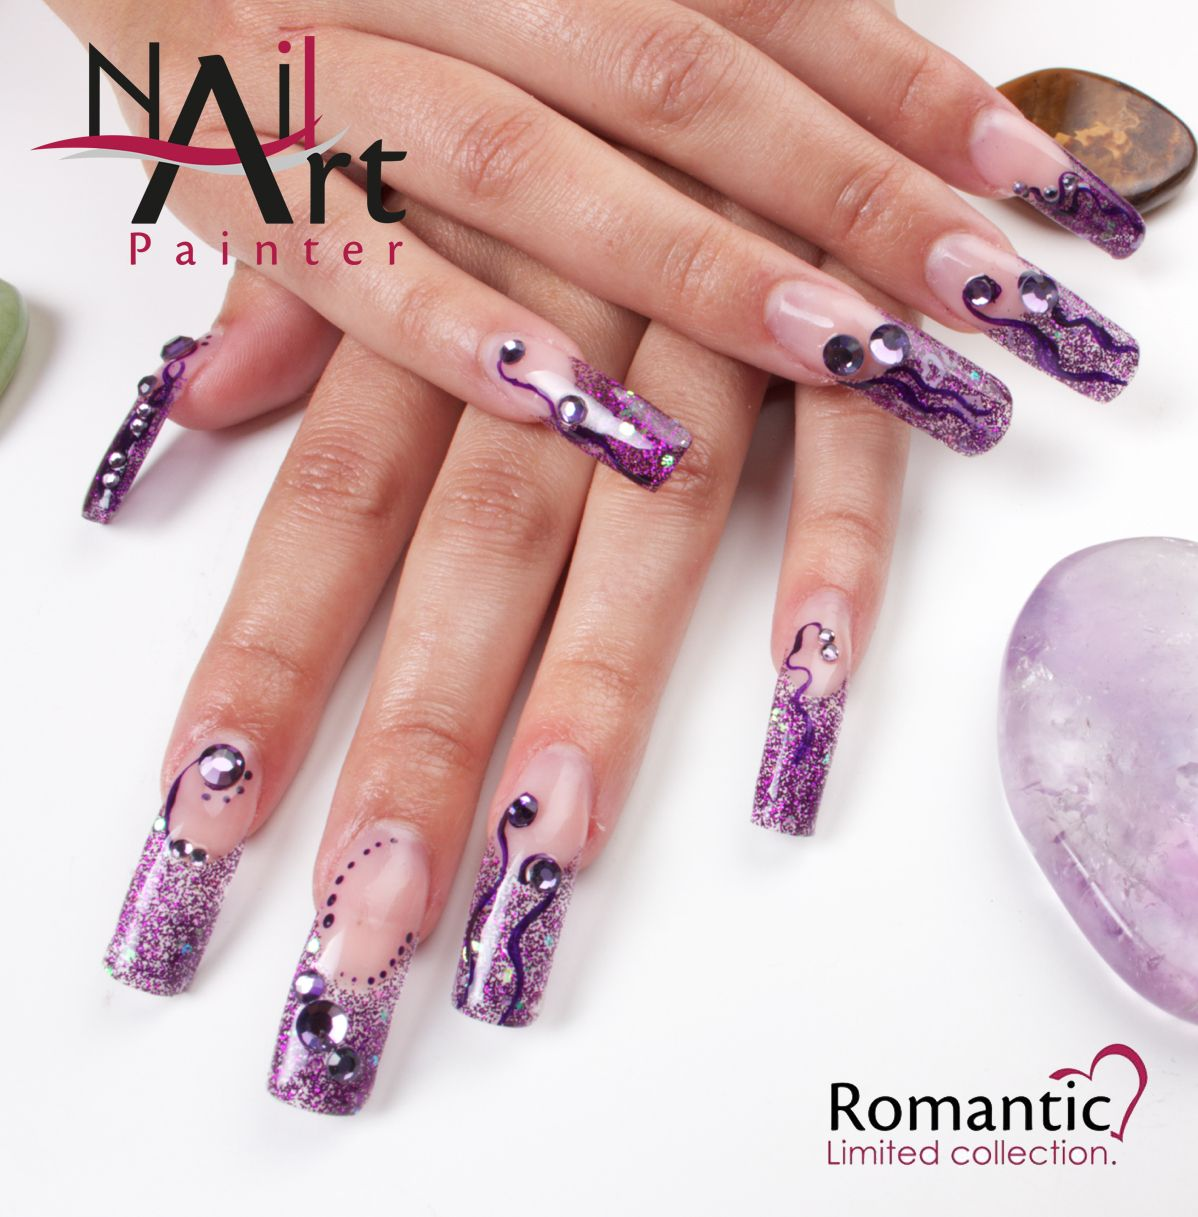 Nail art painter nail art painter pinterest fabulous nails nail art painter prinsesfo Images